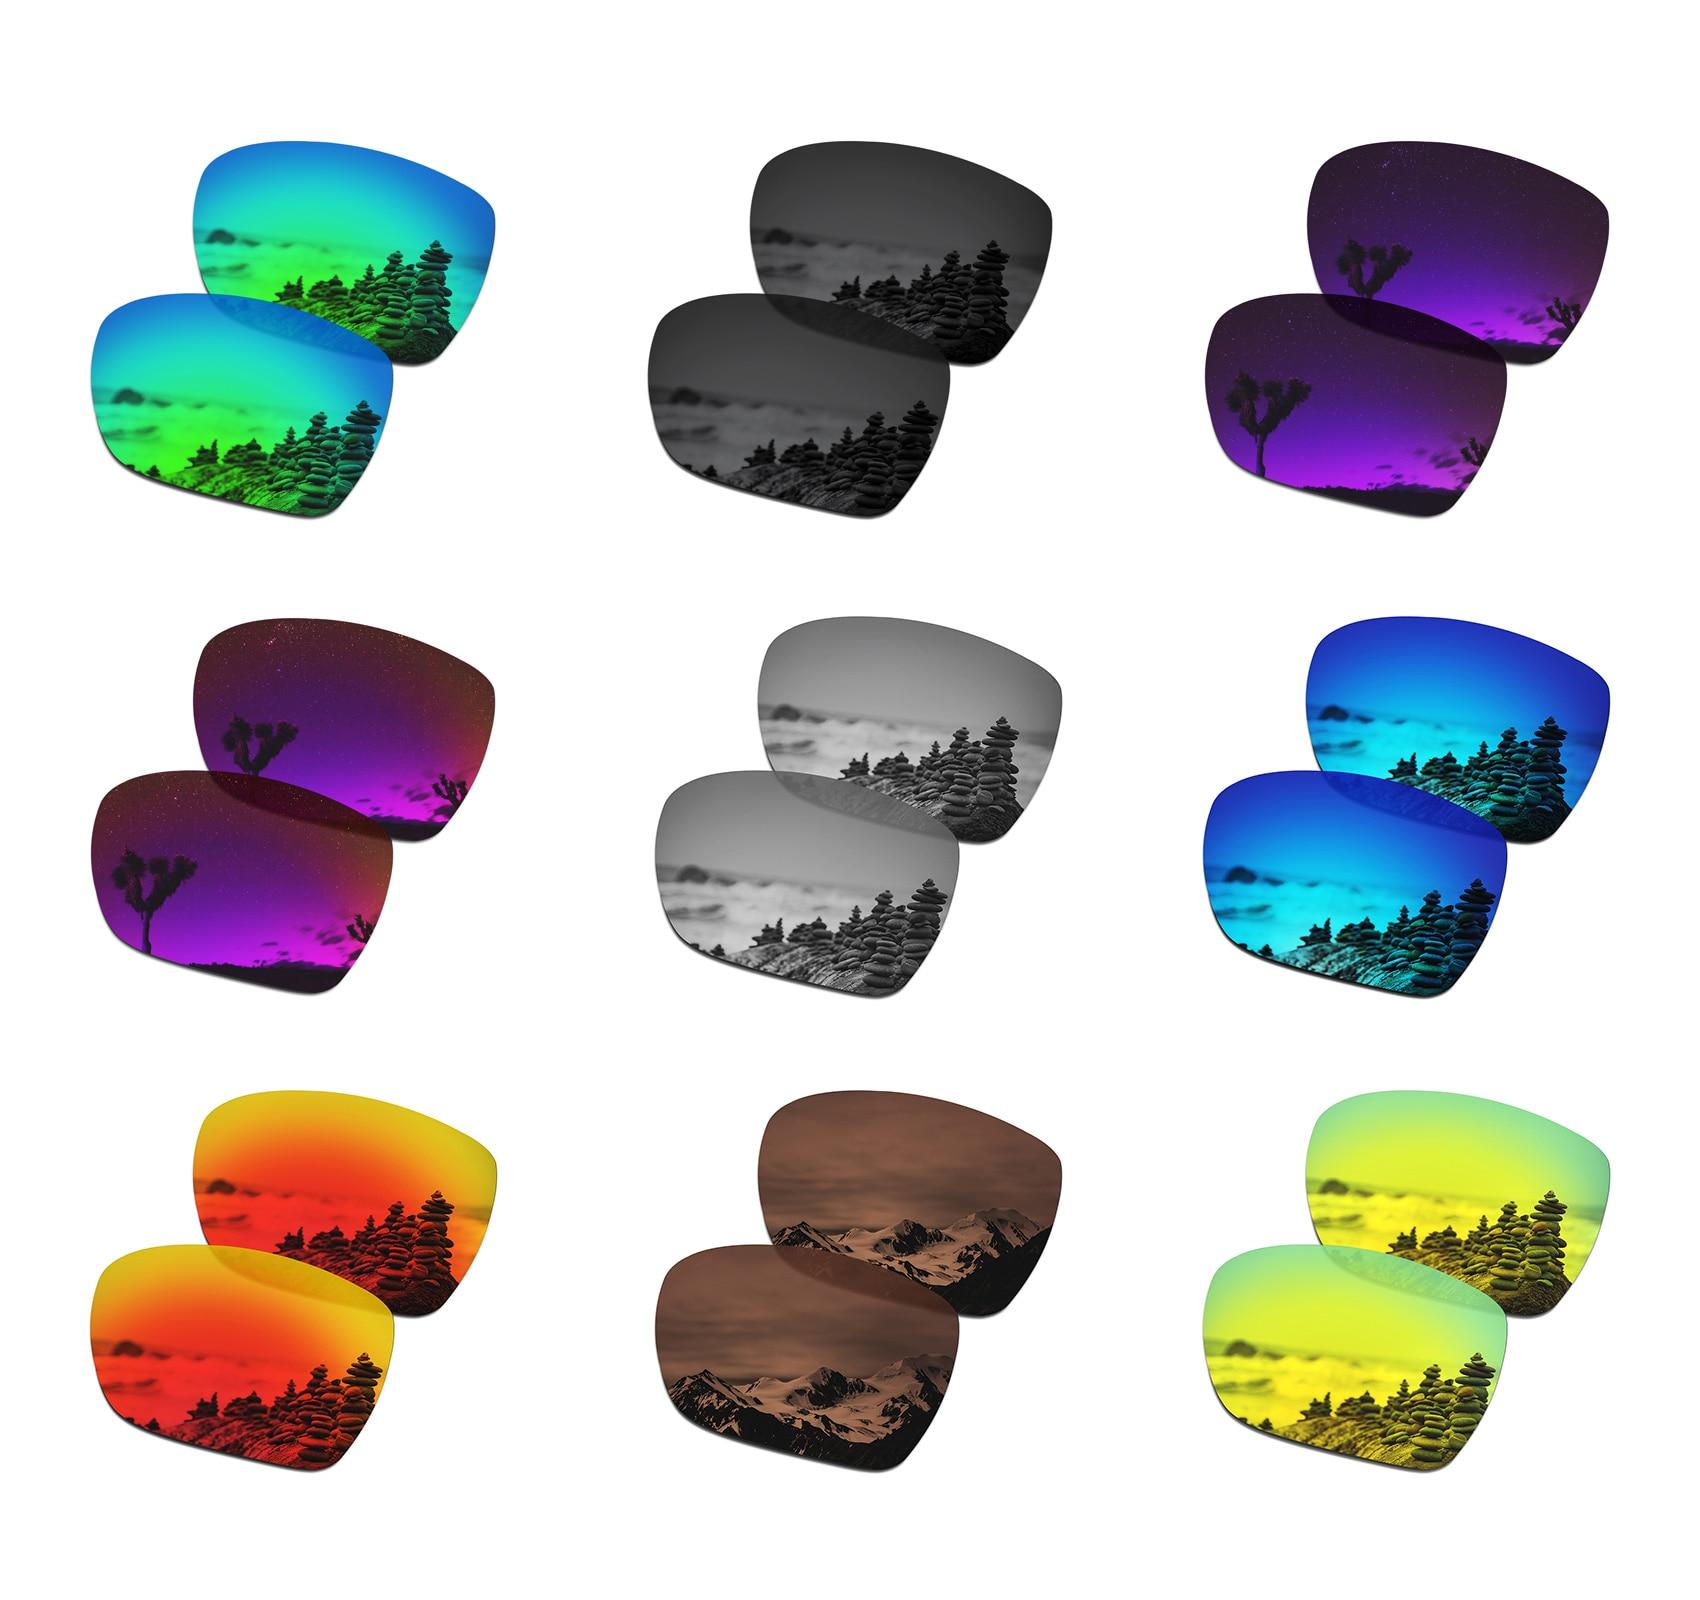 SmartVLT Polarized Replacement Lenses For Oakley Dispatch 1 Sunglasses - Multiple Options